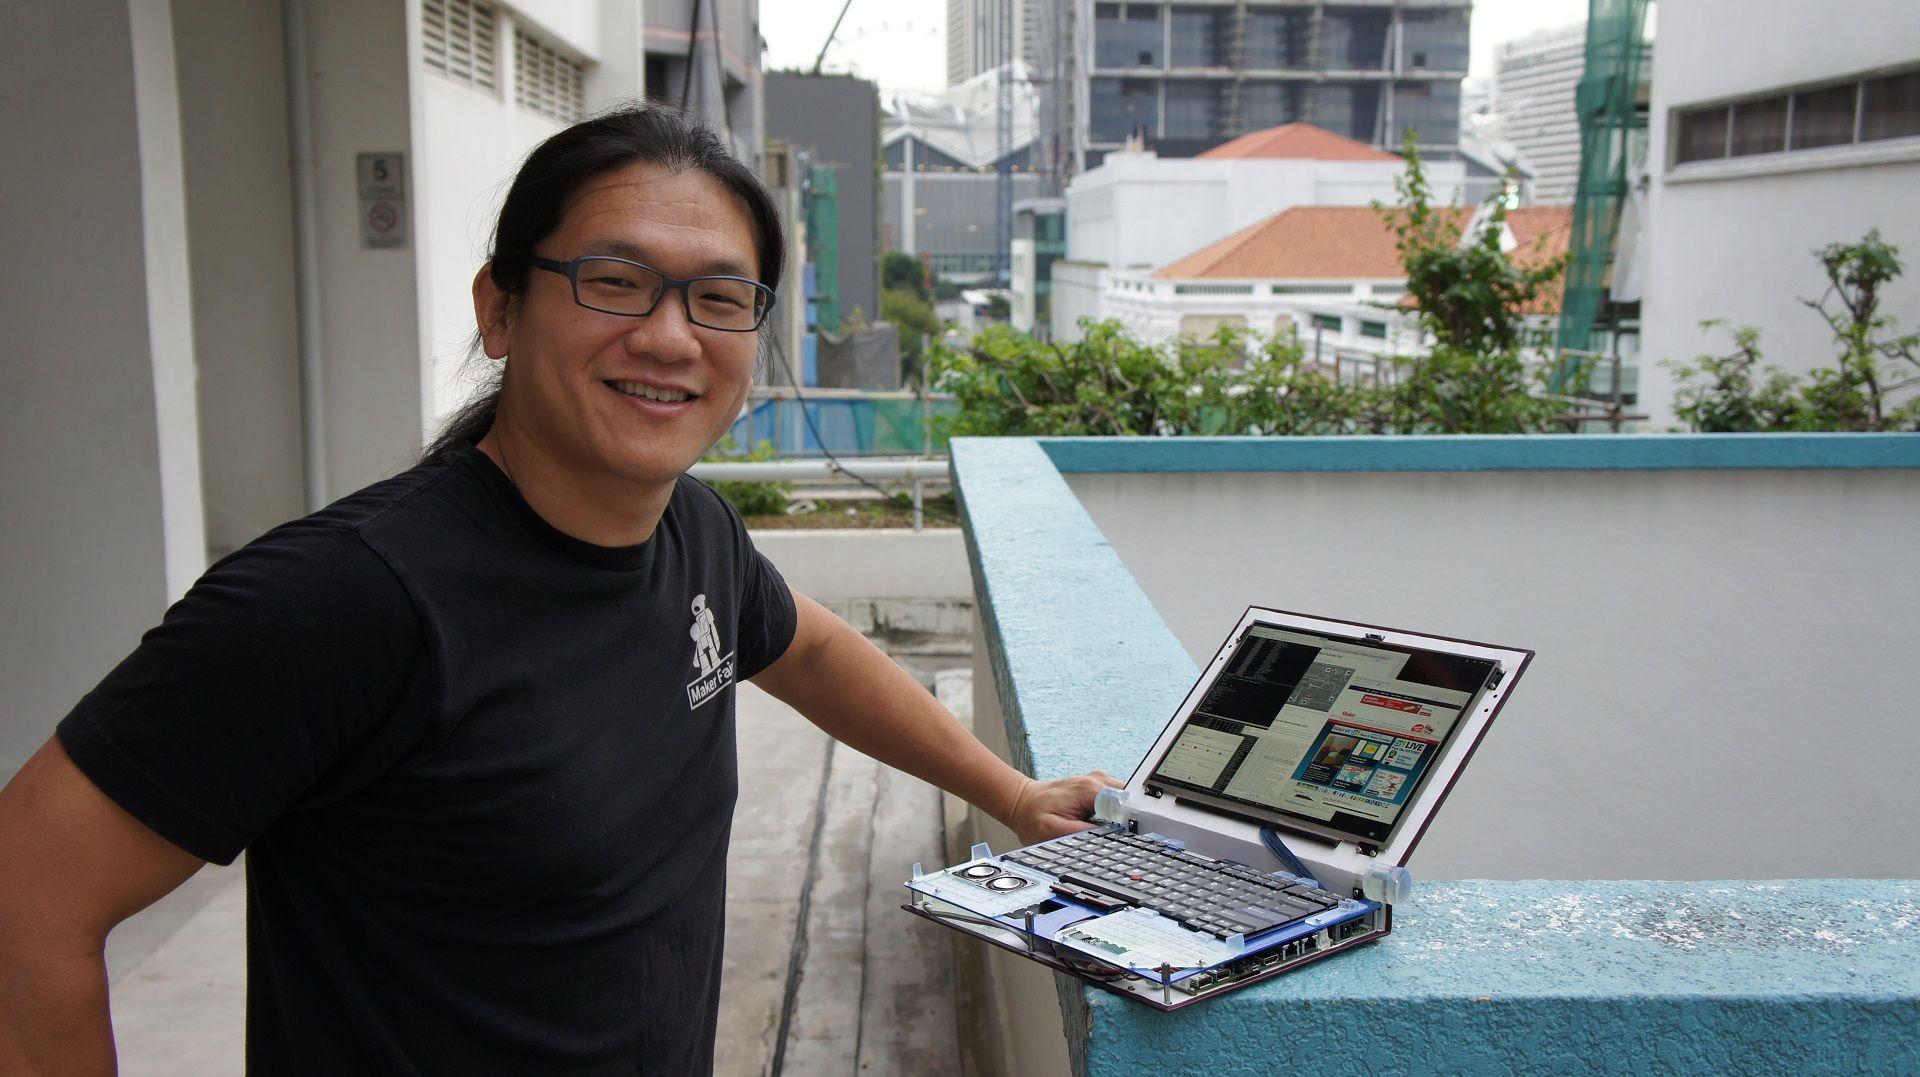 How I Built An Open Source Laptop Make Build A Laptop Diy Laptop Best Laptops